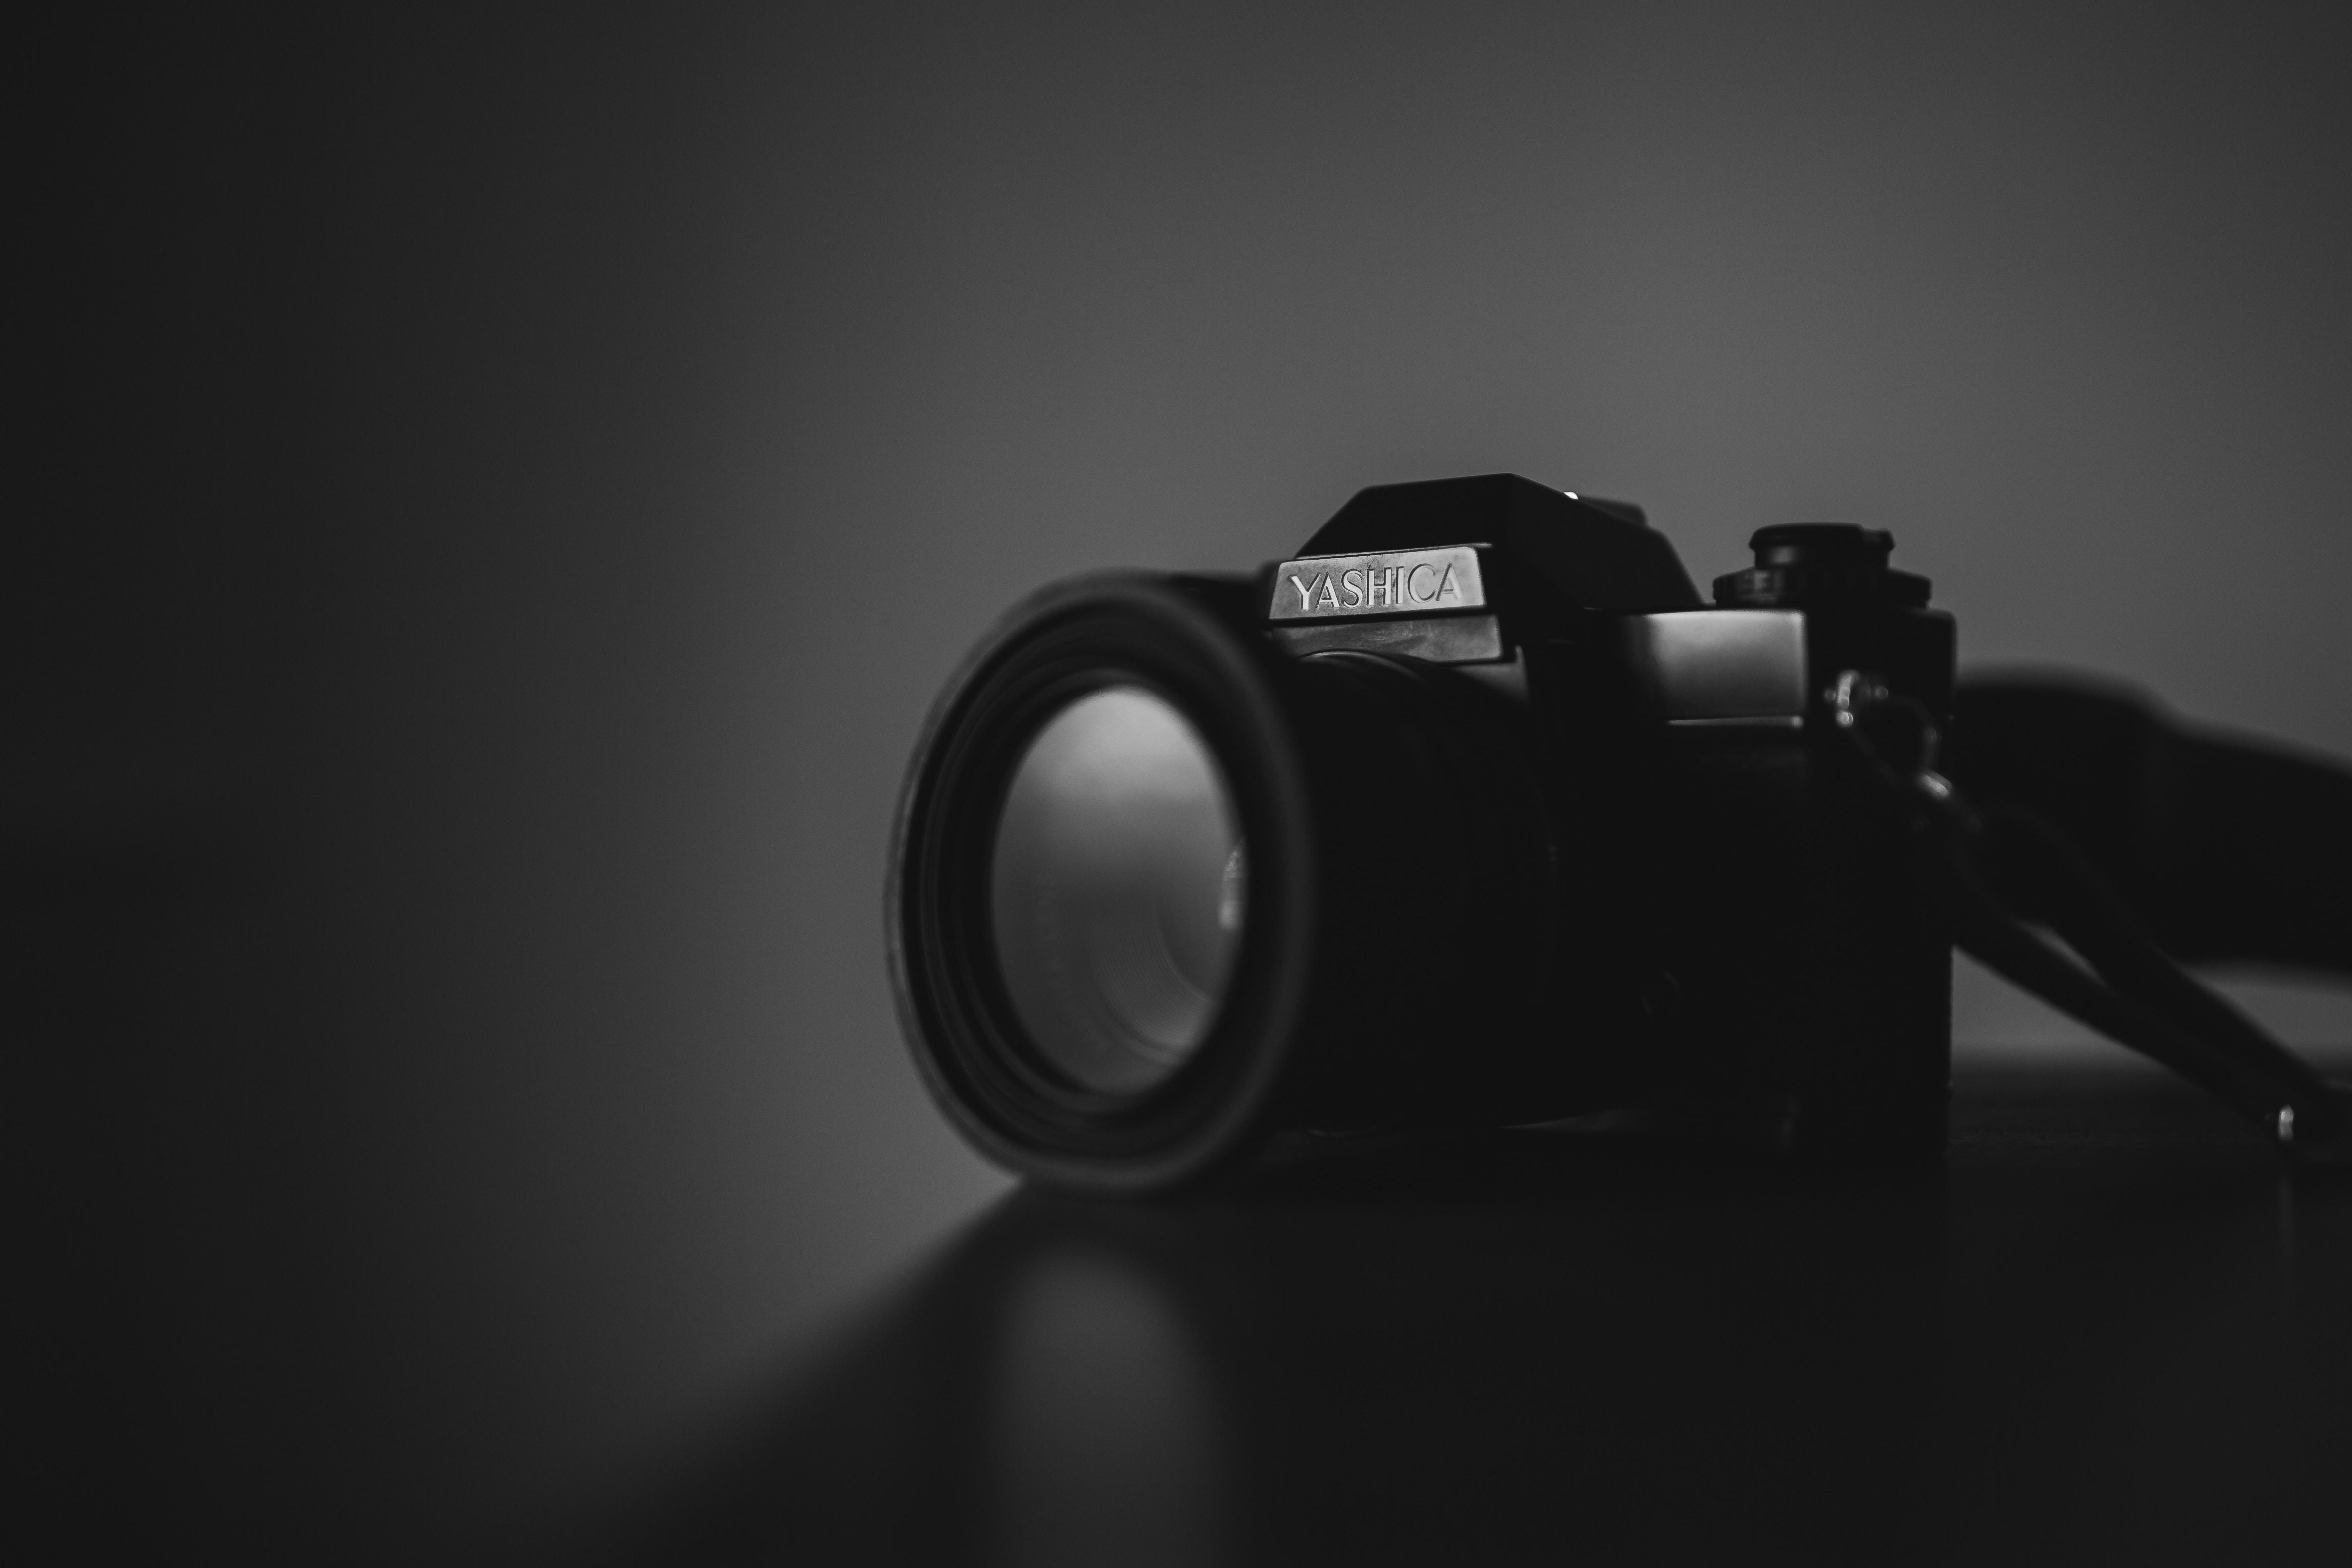 shallow focus photography of black Yashica camera